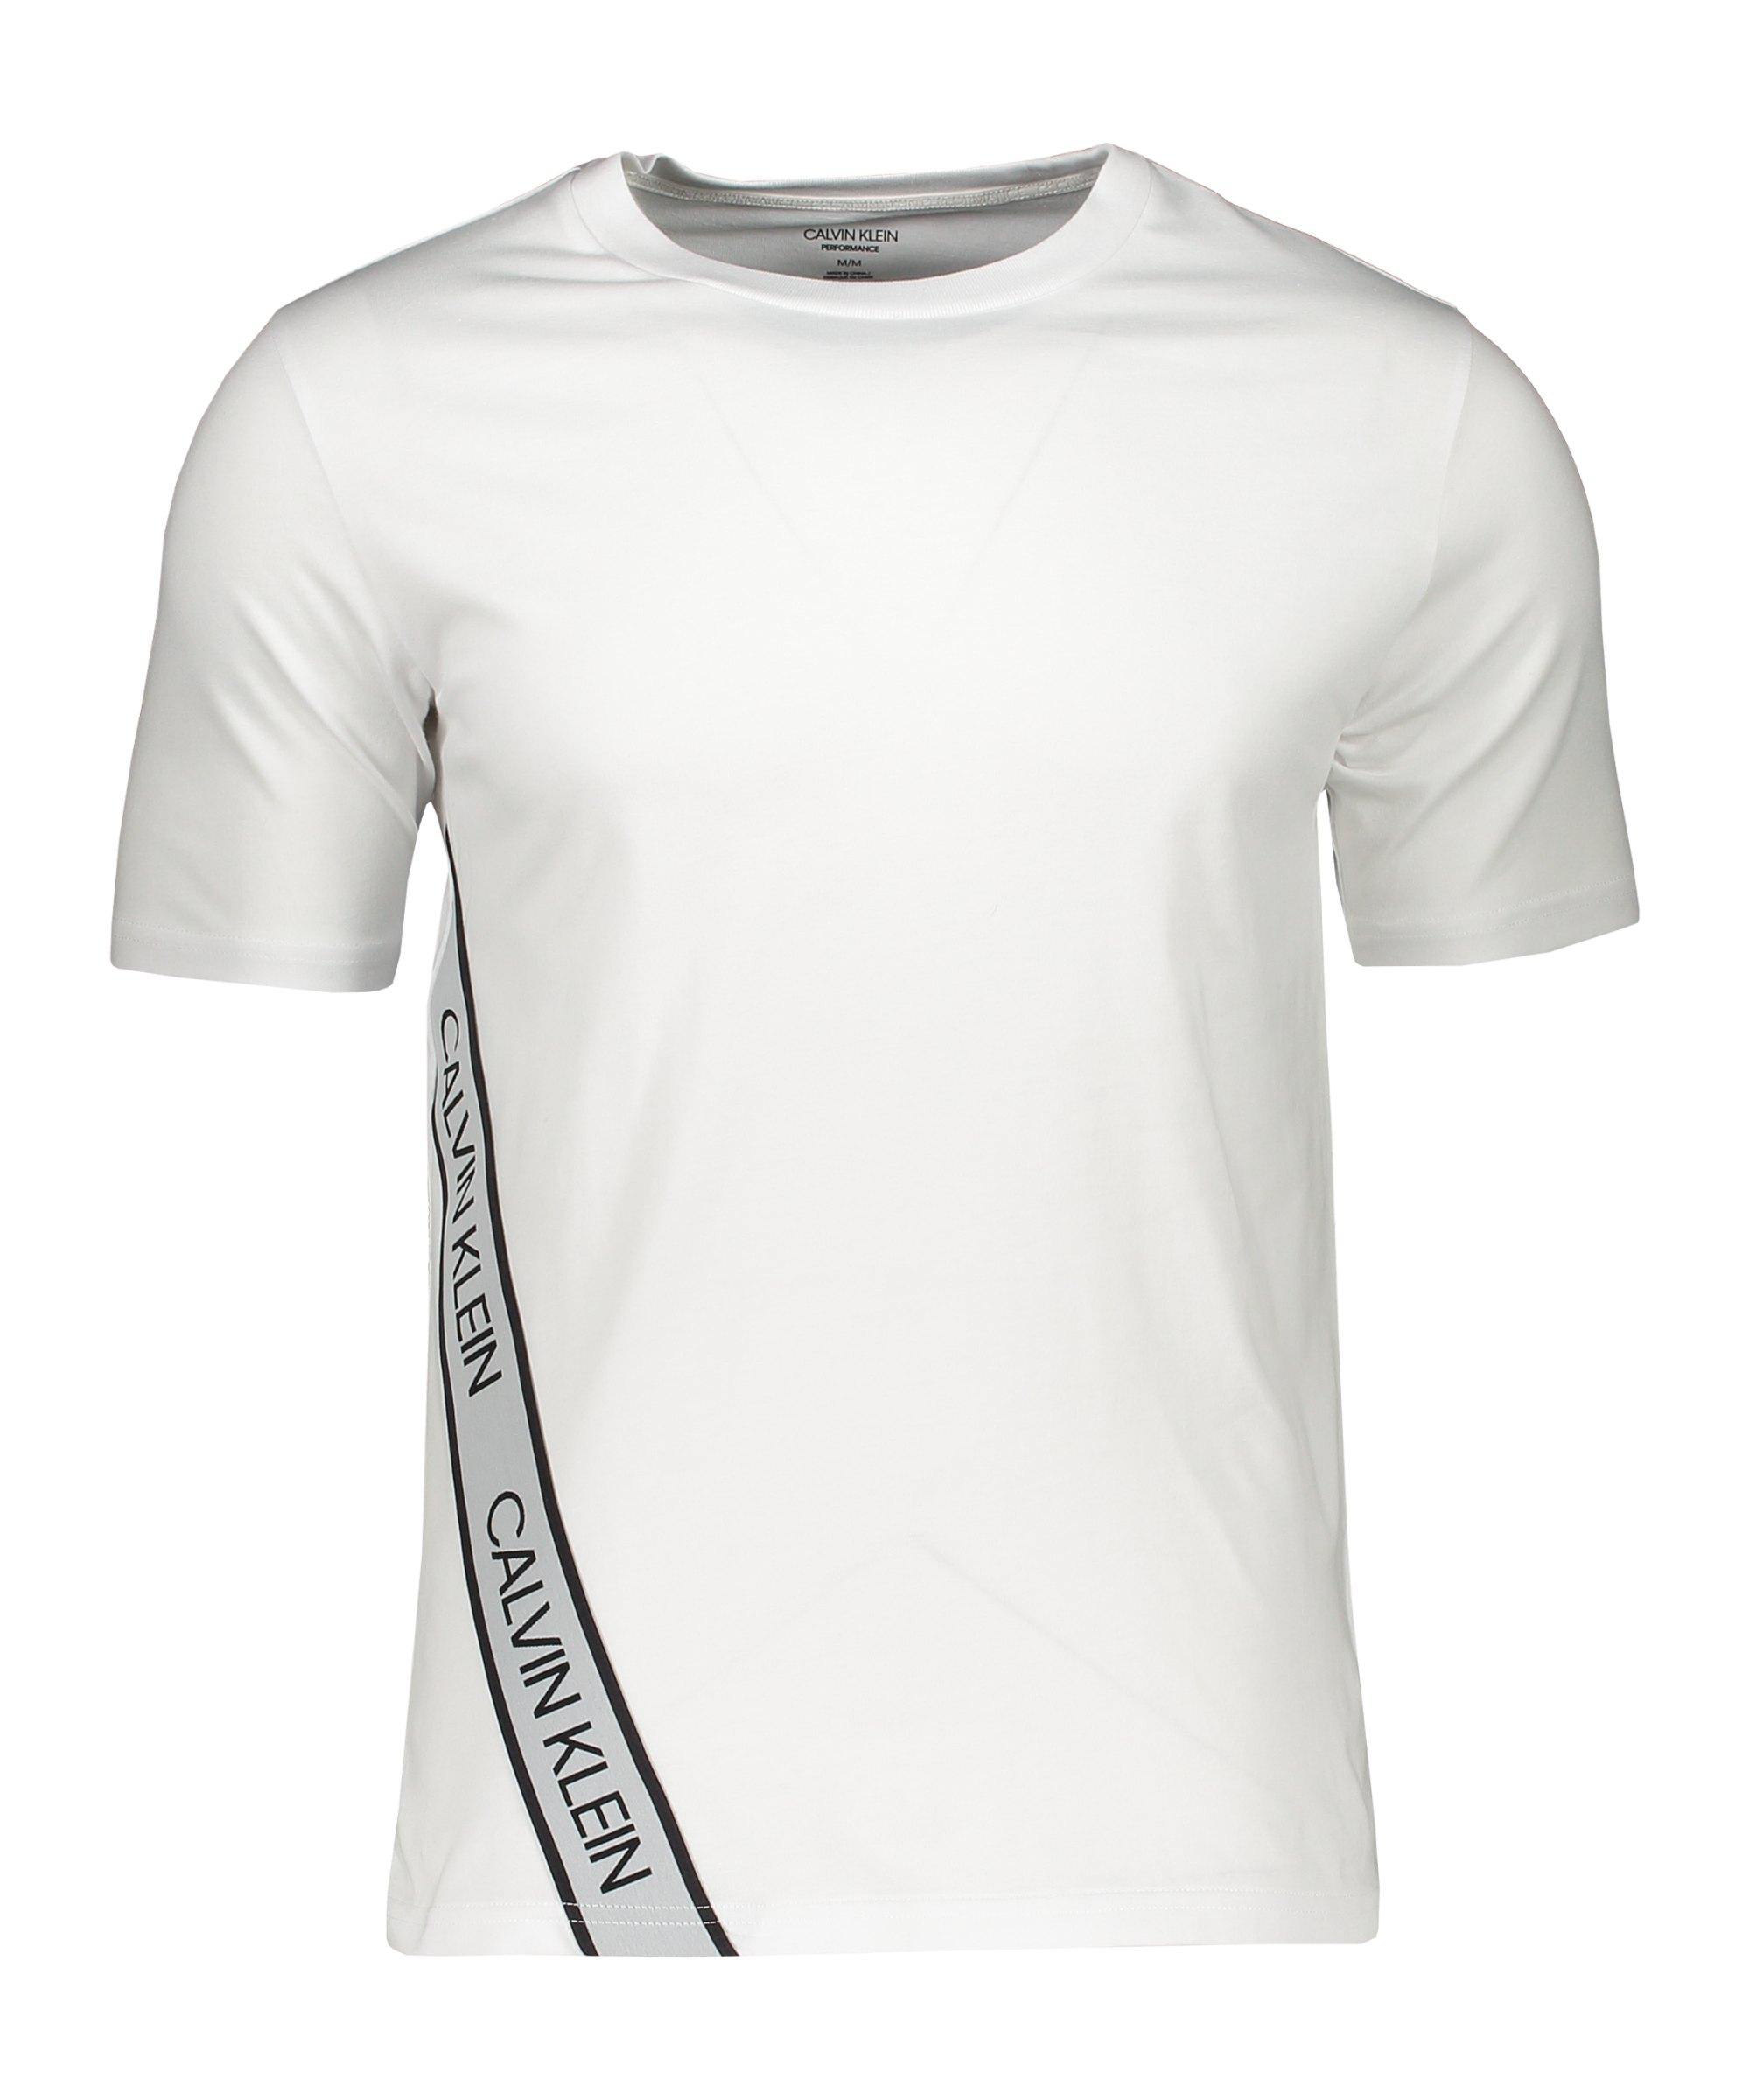 Calvin Klein T-Shirt Weiss Schwarz F100 - weiss